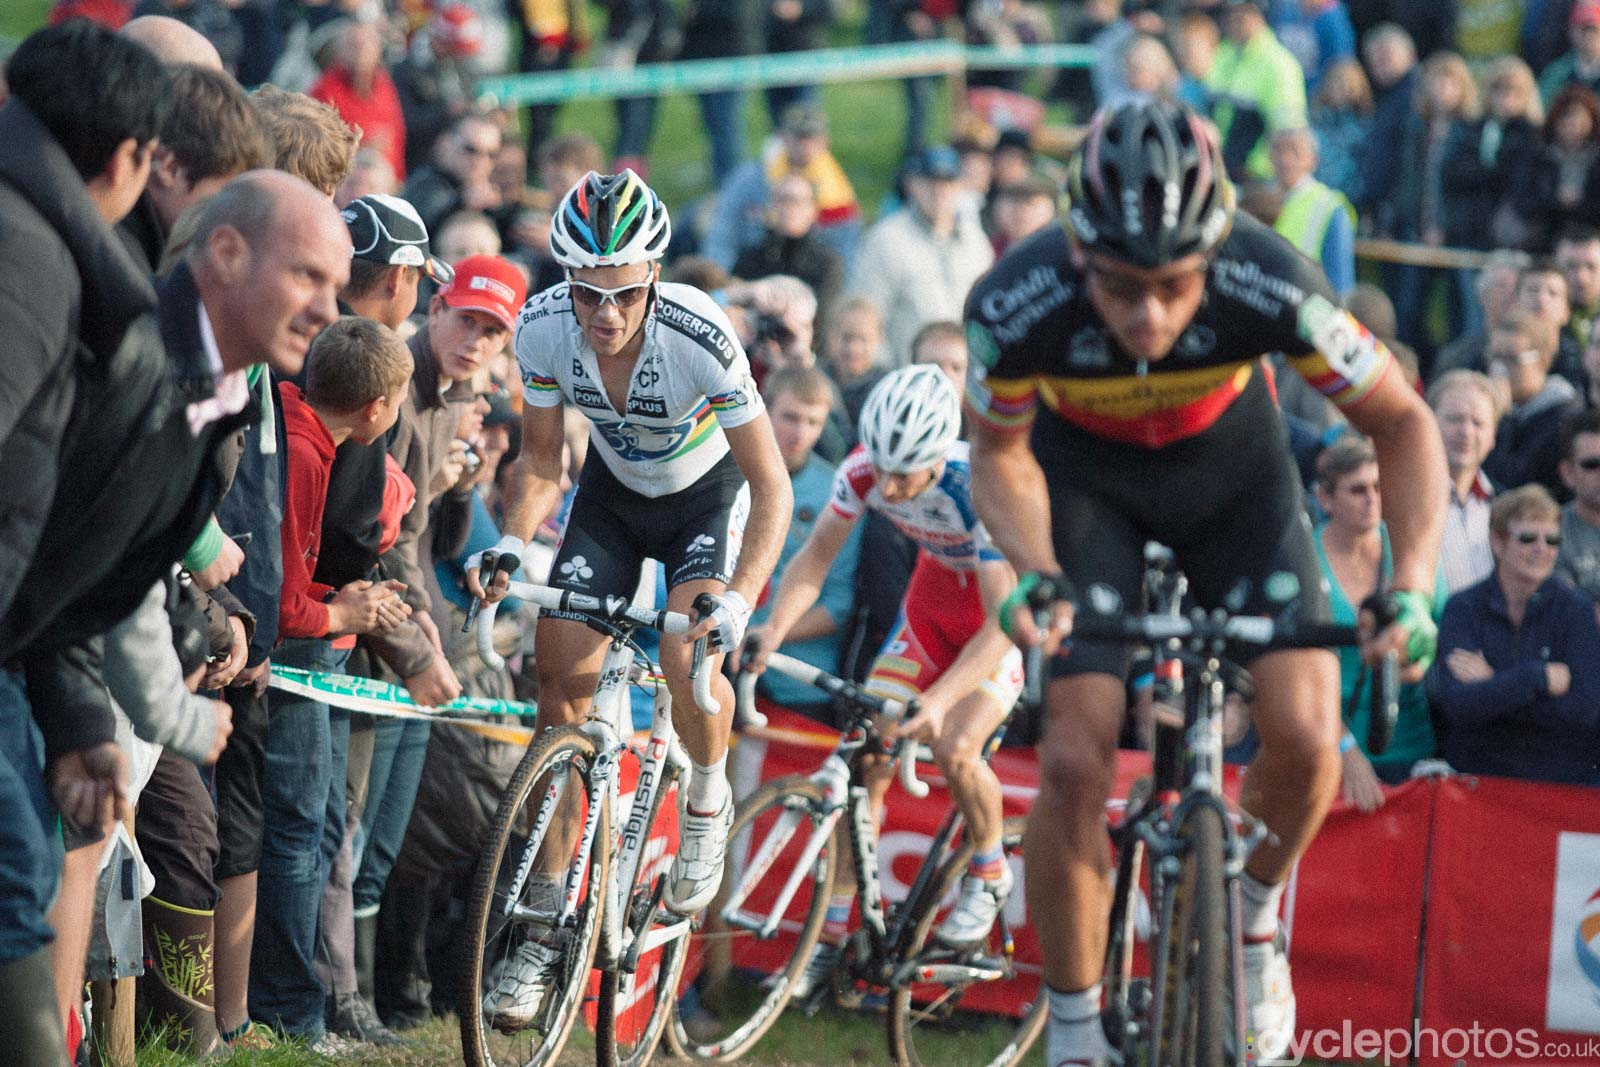 2012-cyclephotos-cyclocross-ruddervoorde-165343-niels-albert